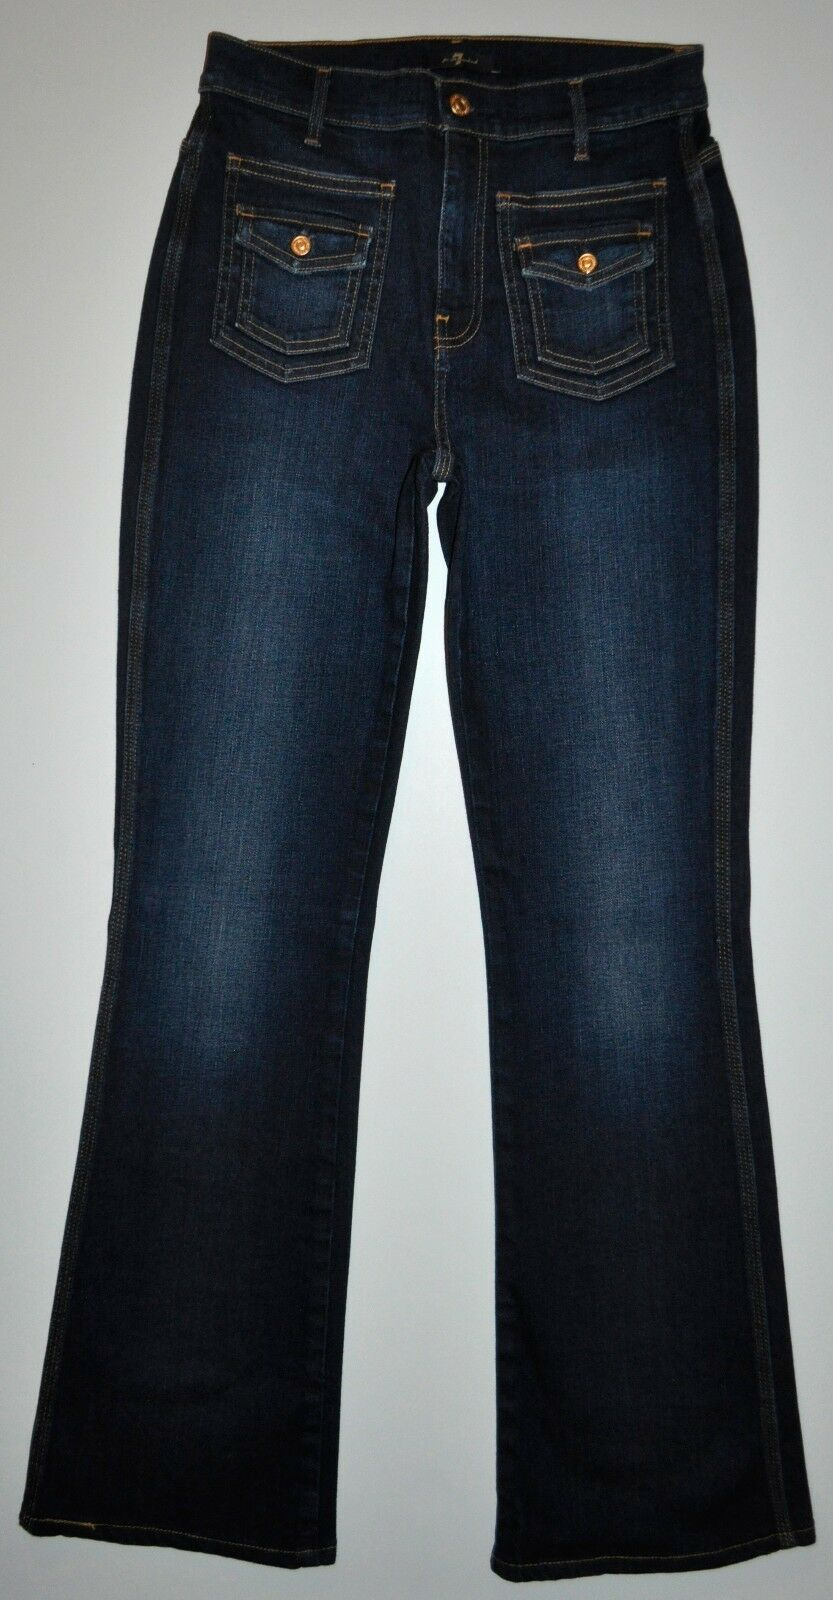 7 FAM Mankind Dark bluee High Waist Boot Cut Flare Jeans Size 28 X 31 Stretch